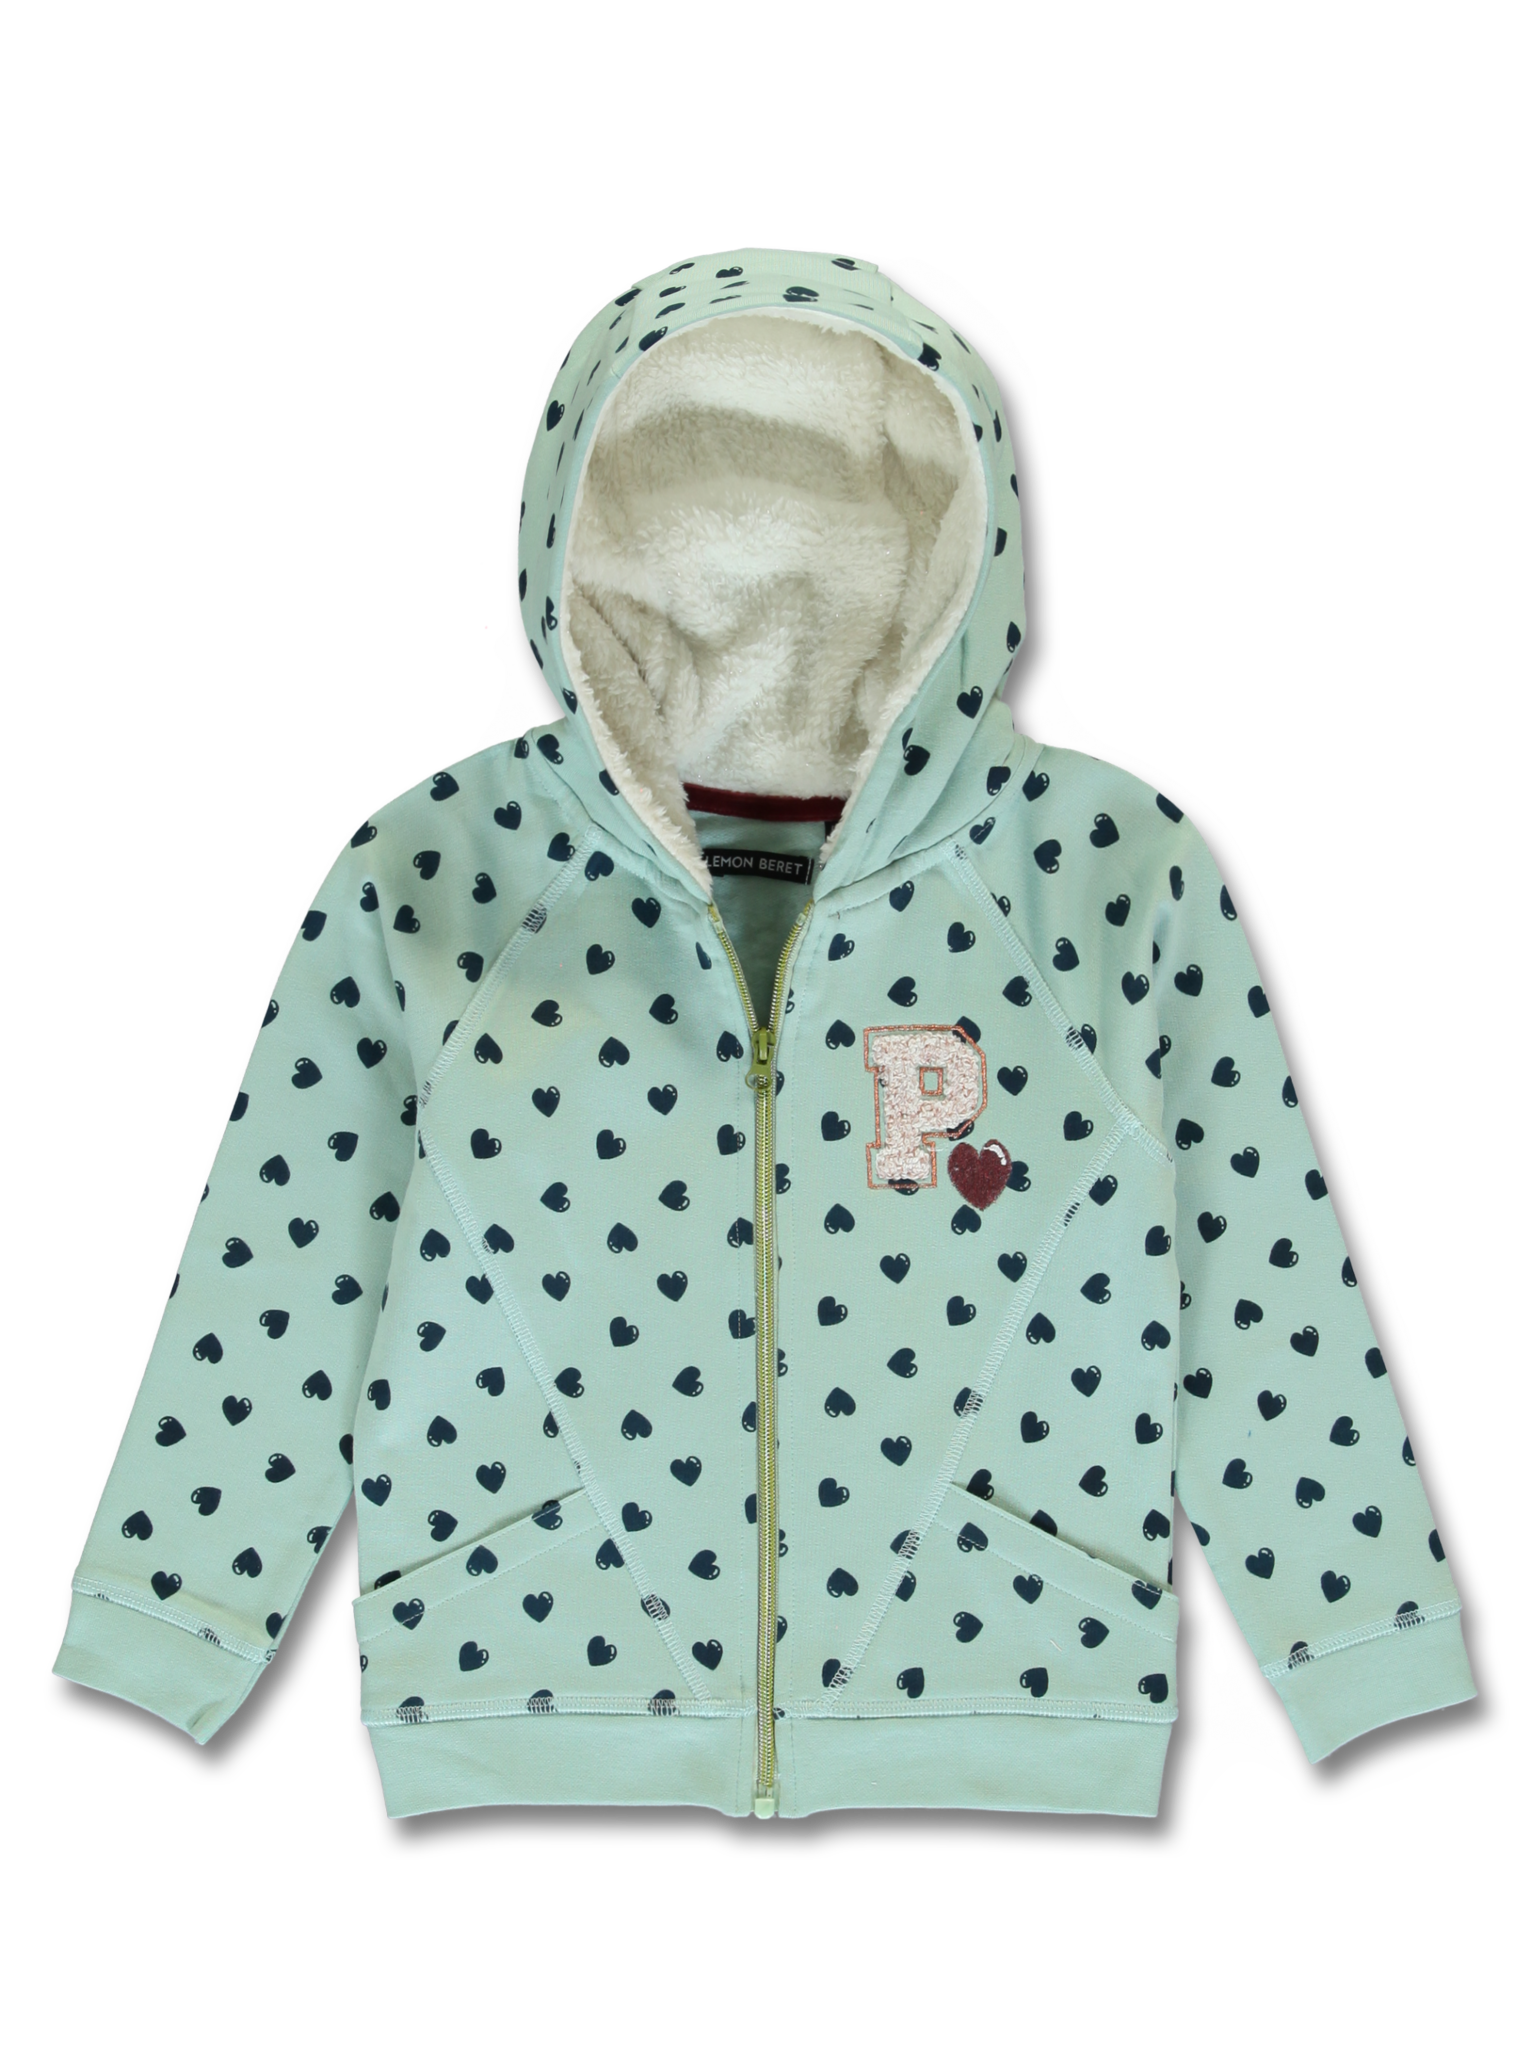 All Brands | Winterproducts Small Girls | Cardigan Sweater | 12 pcs/box